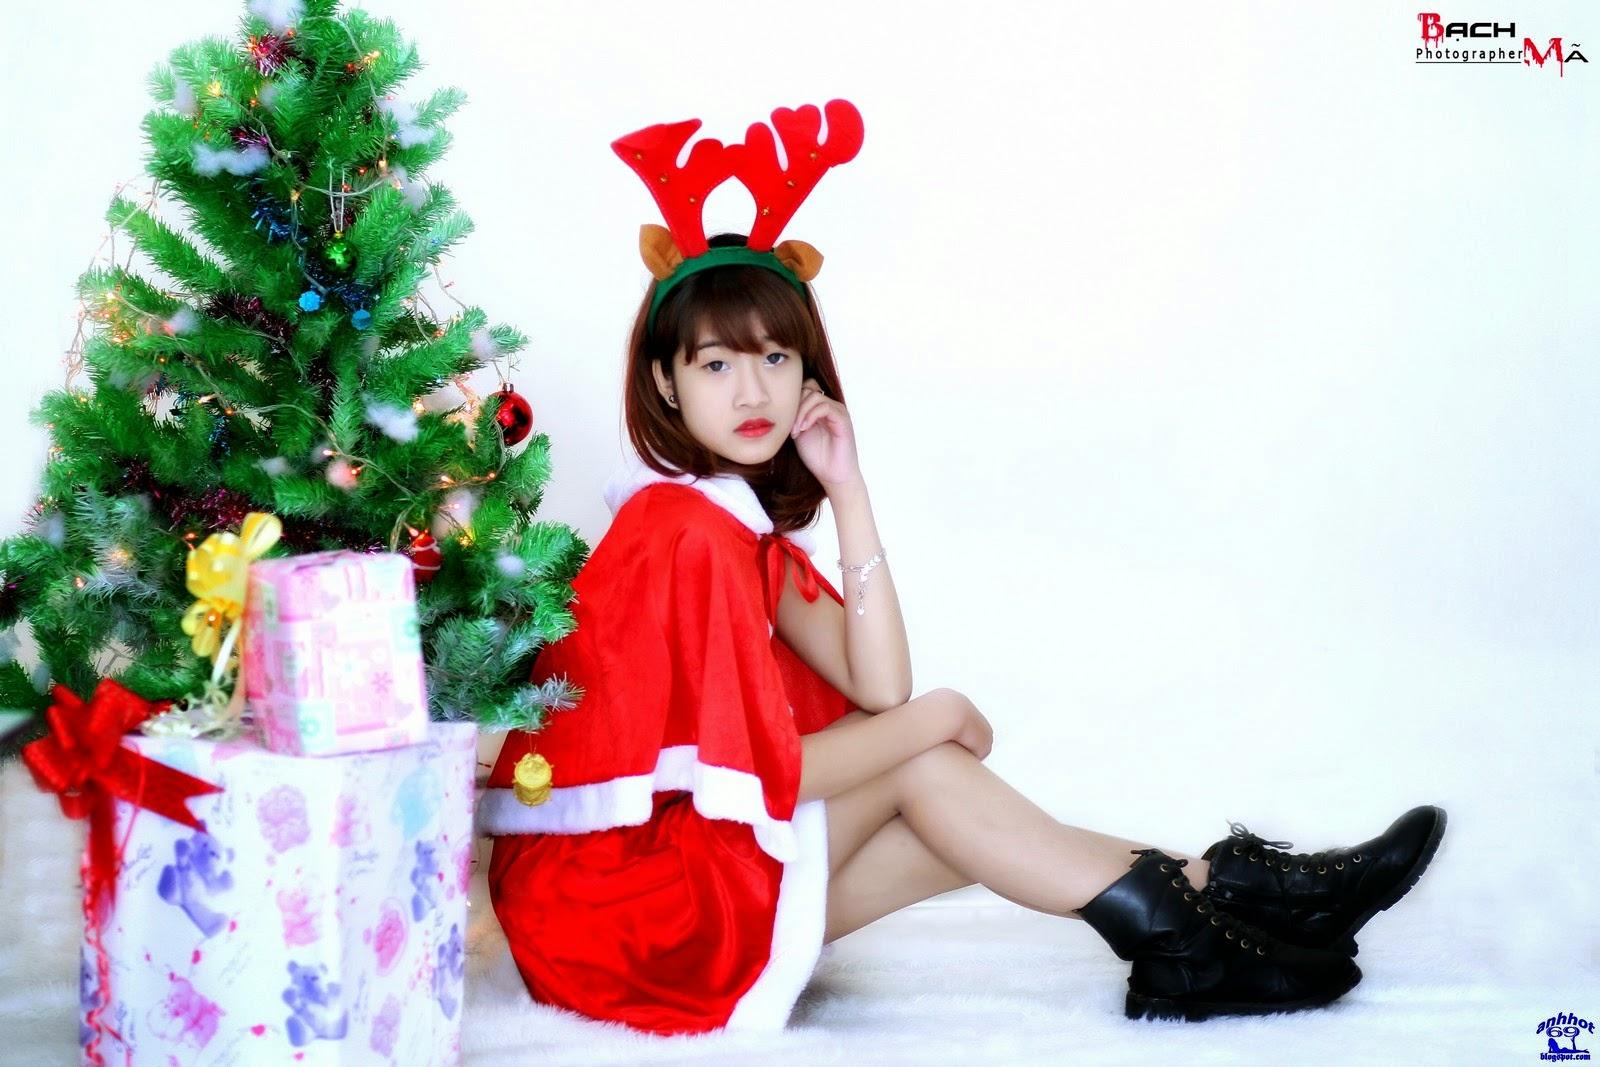 merry-christmas_1412251610_04